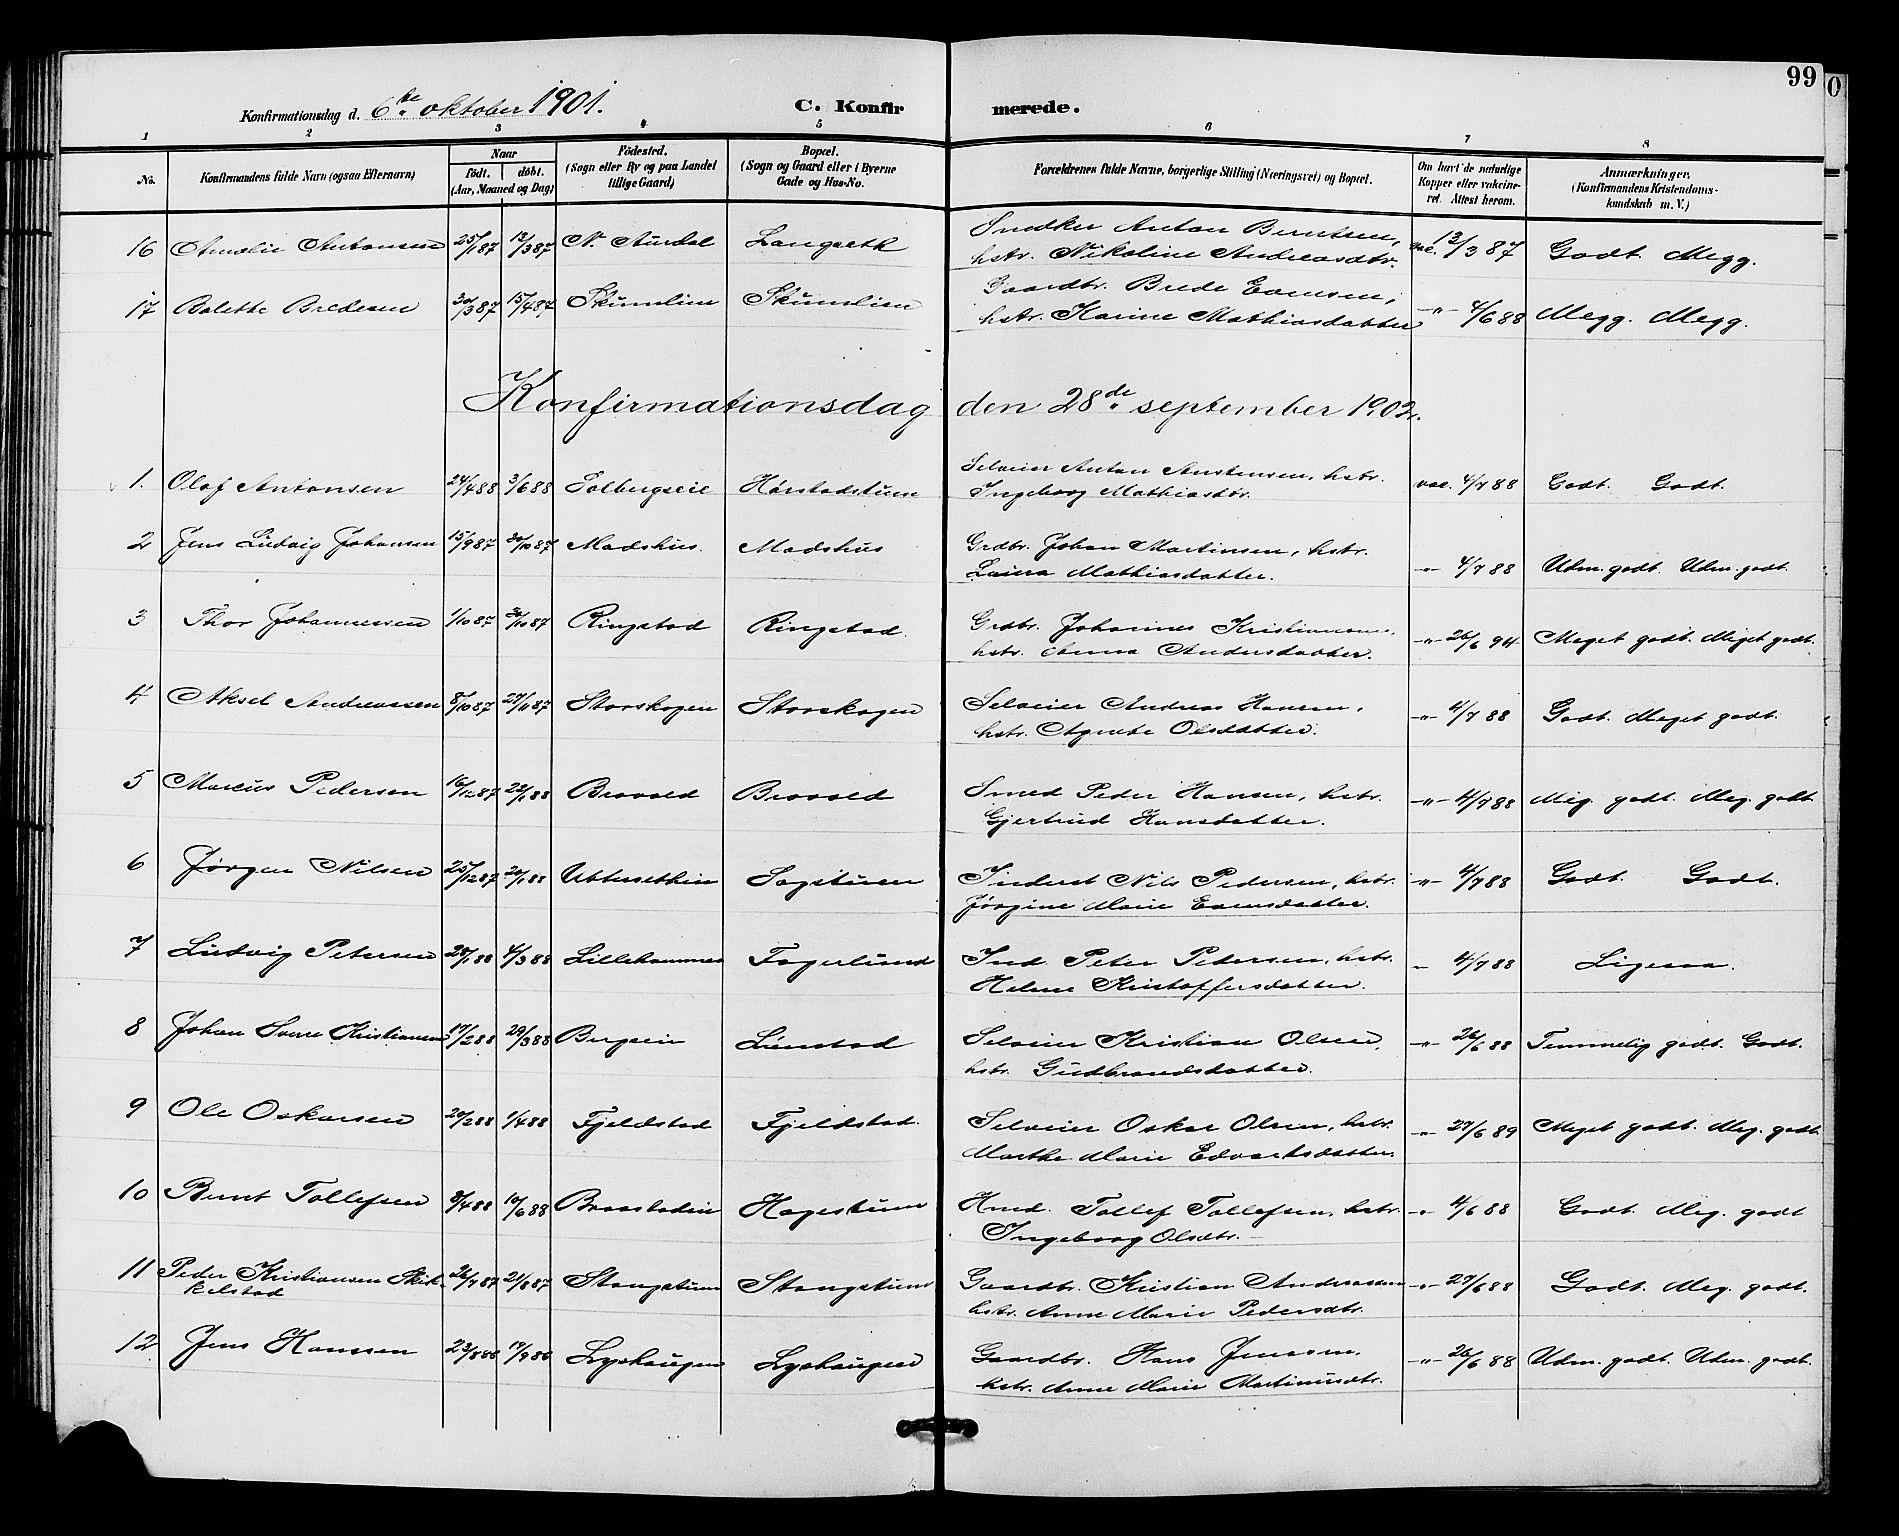 SAH, Vardal prestekontor, H/Ha/Hab/L0011: Klokkerbok nr. 11, 1899-1913, s. 99